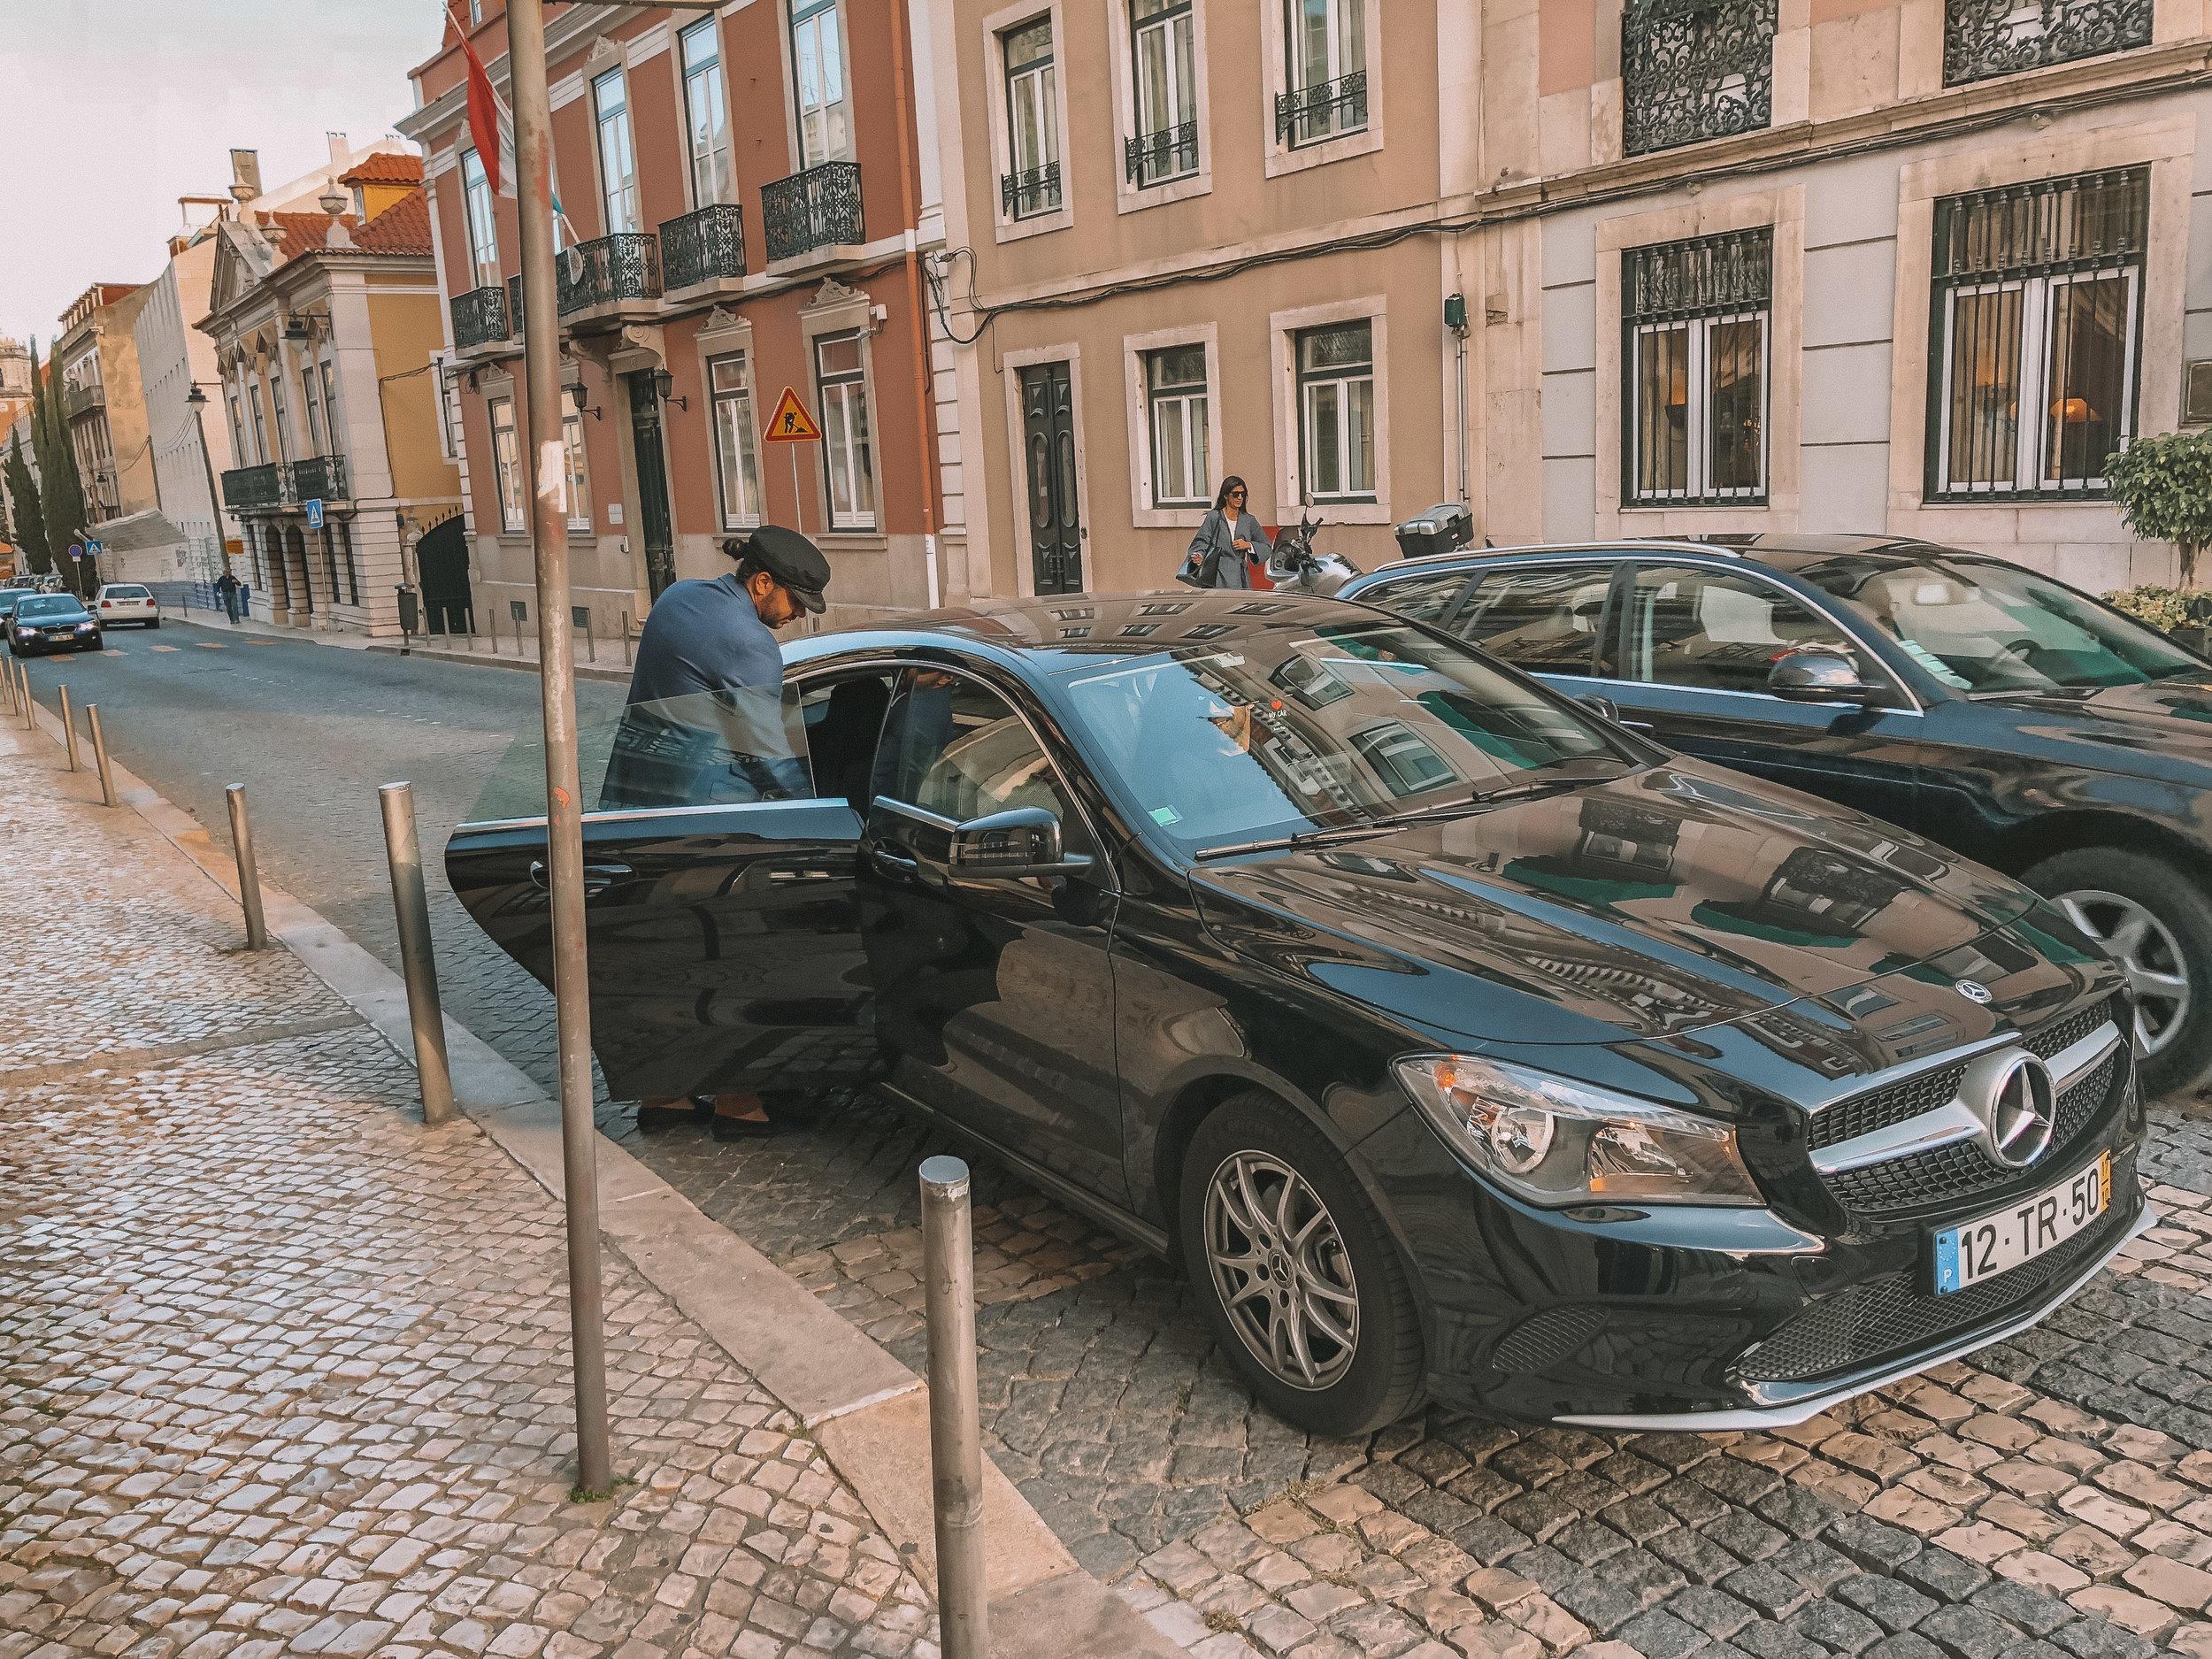 uberX in Lisbon